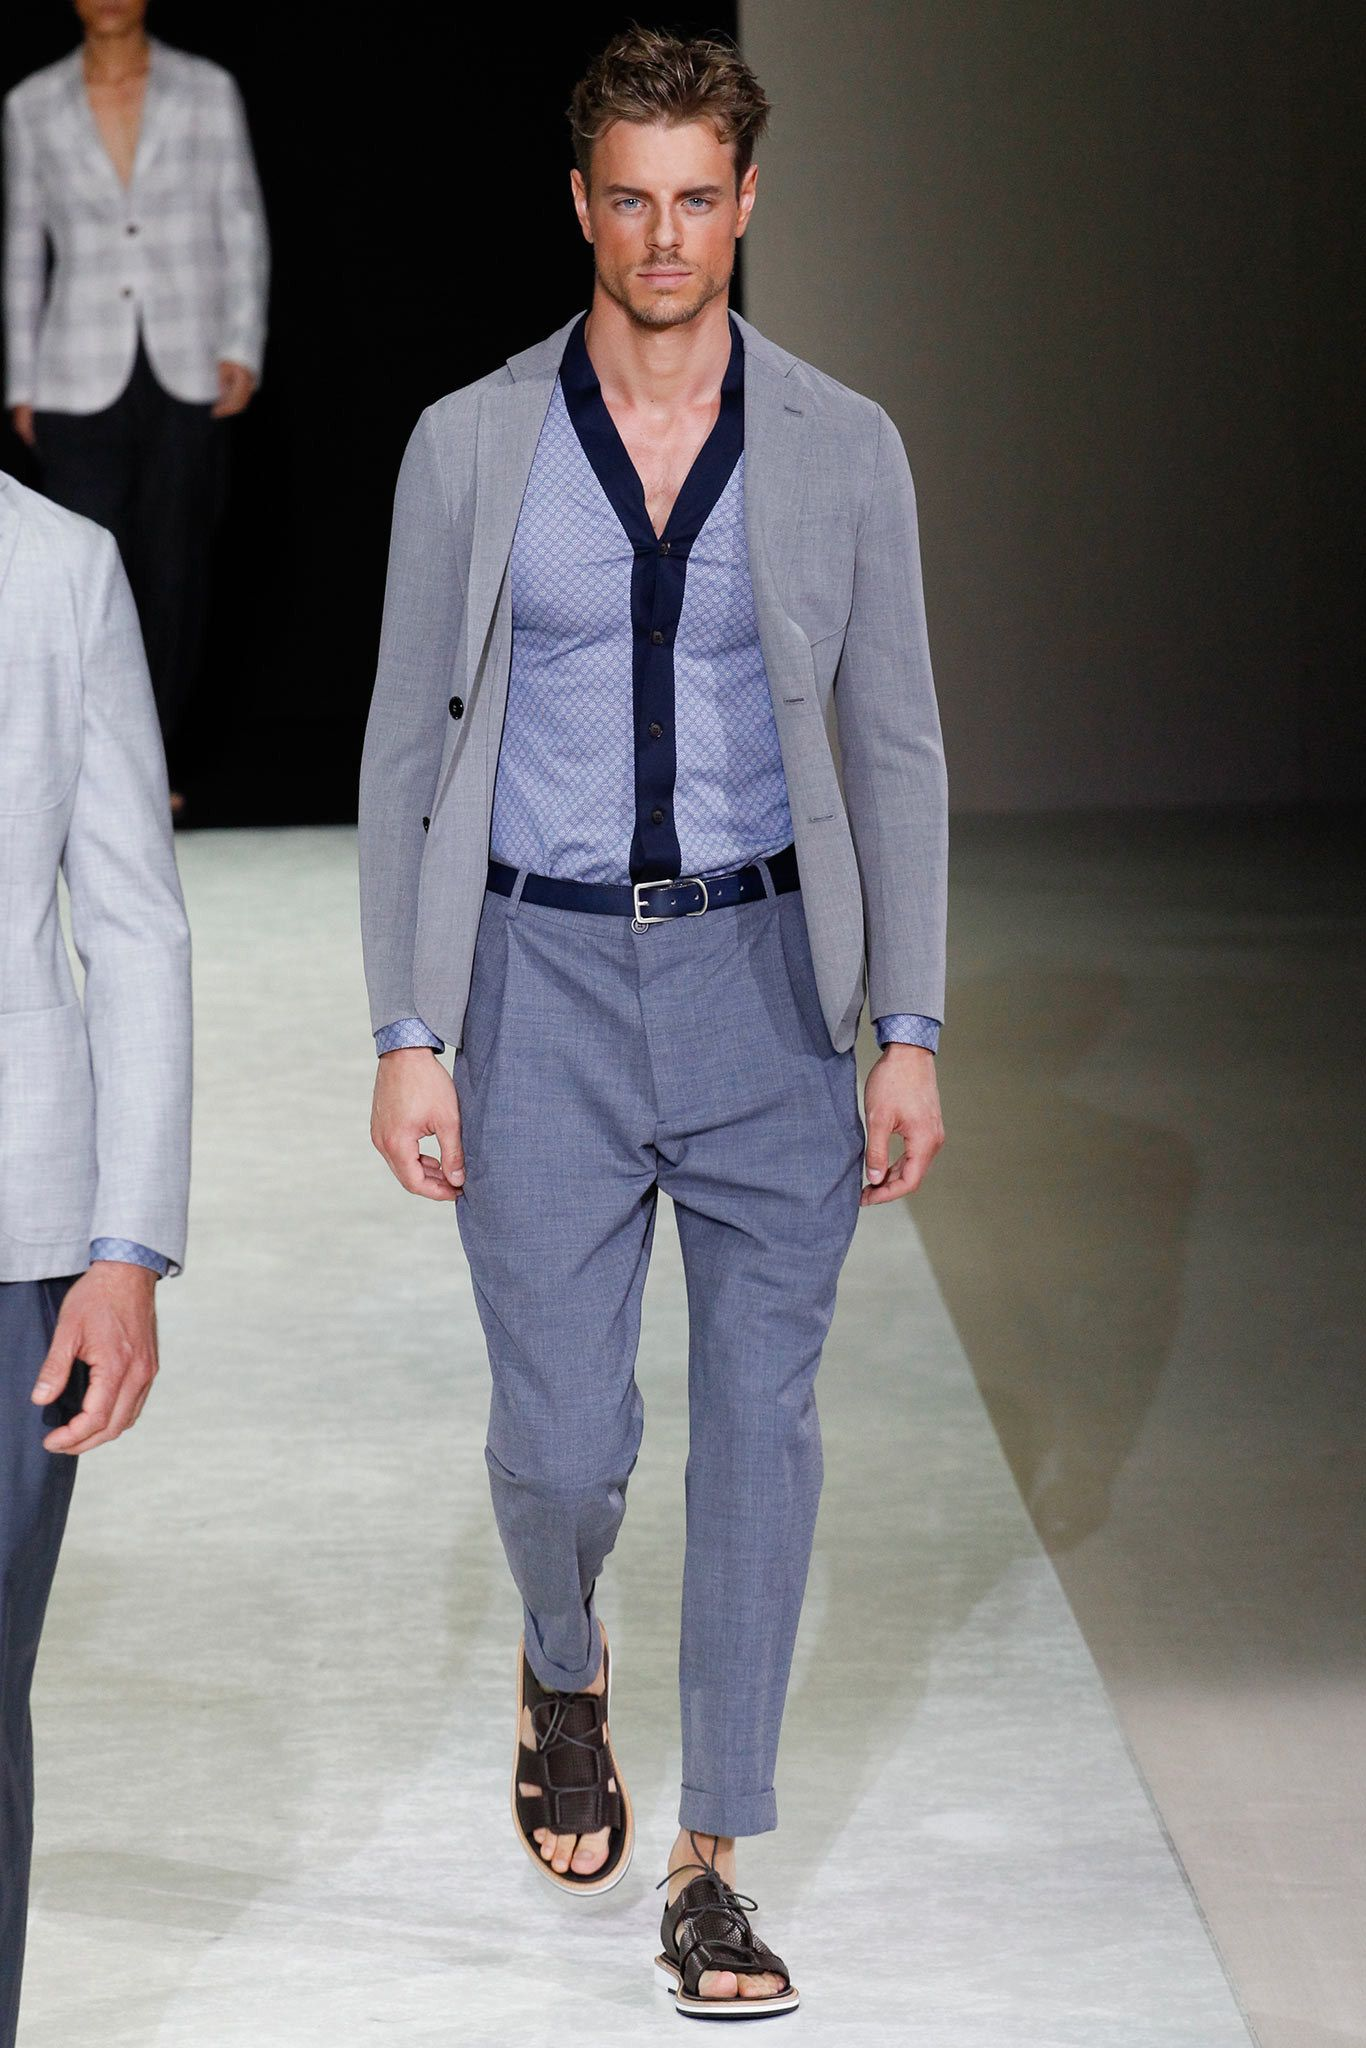 d483d3b86c9 Giorgio Armani Spring 2015 Menswear Fashion Show ...